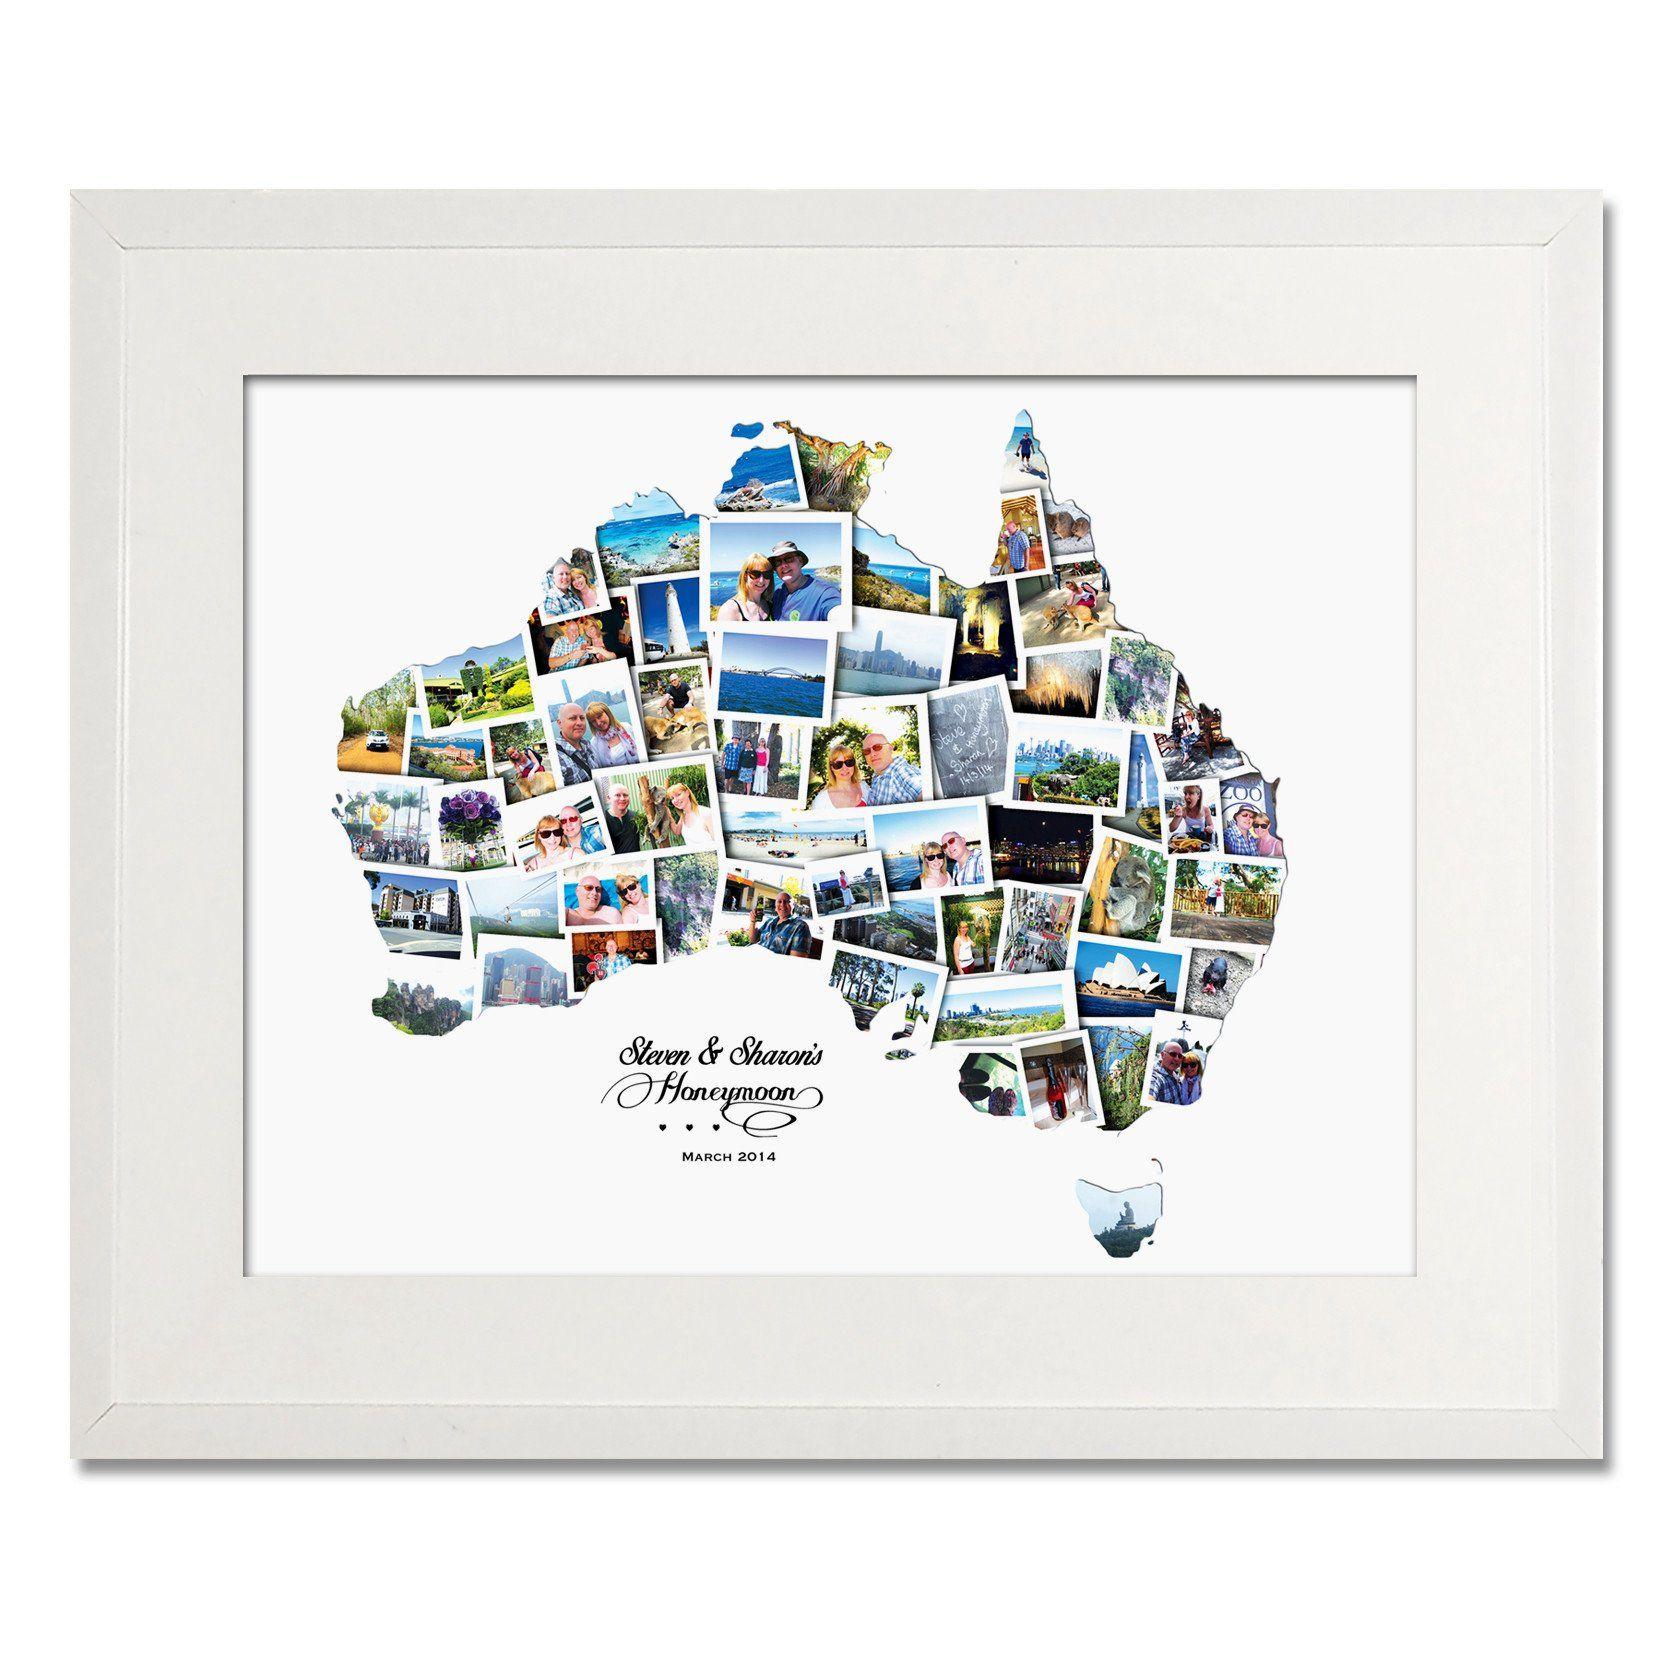 Australia Wedding, Honeymoon & Anniversary Collage